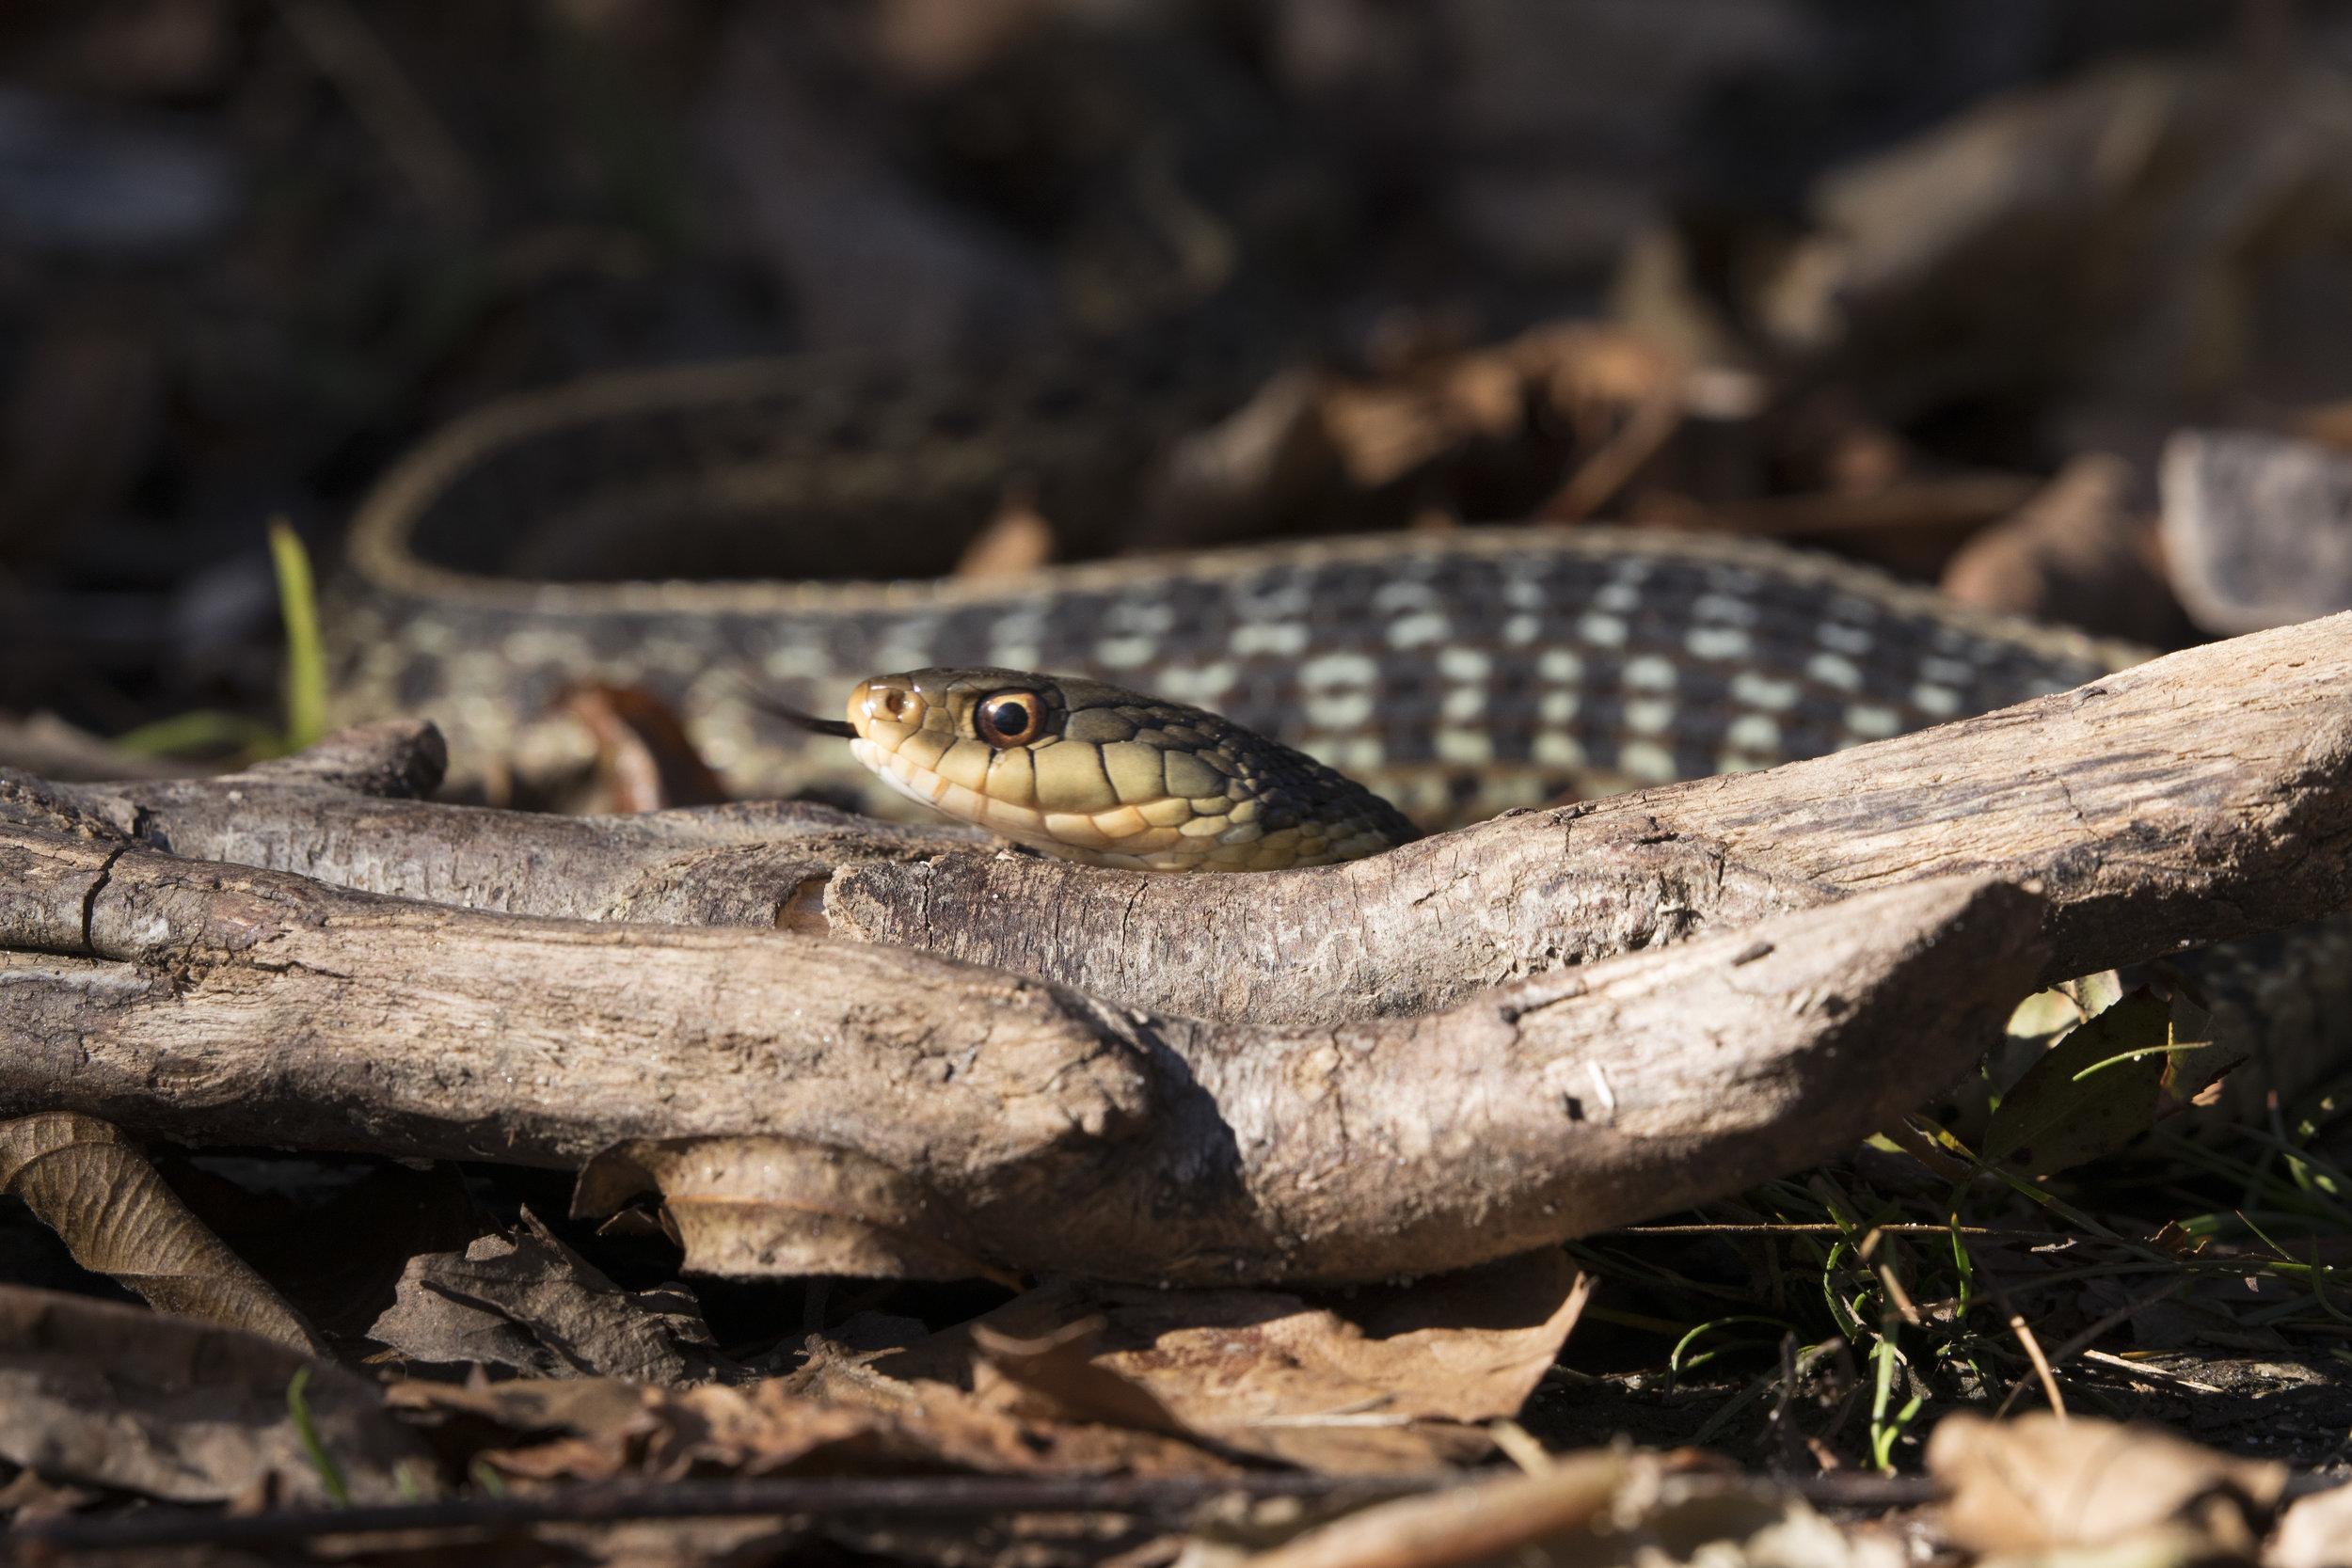 Occoquan National Wildlife Refuge, October 2018